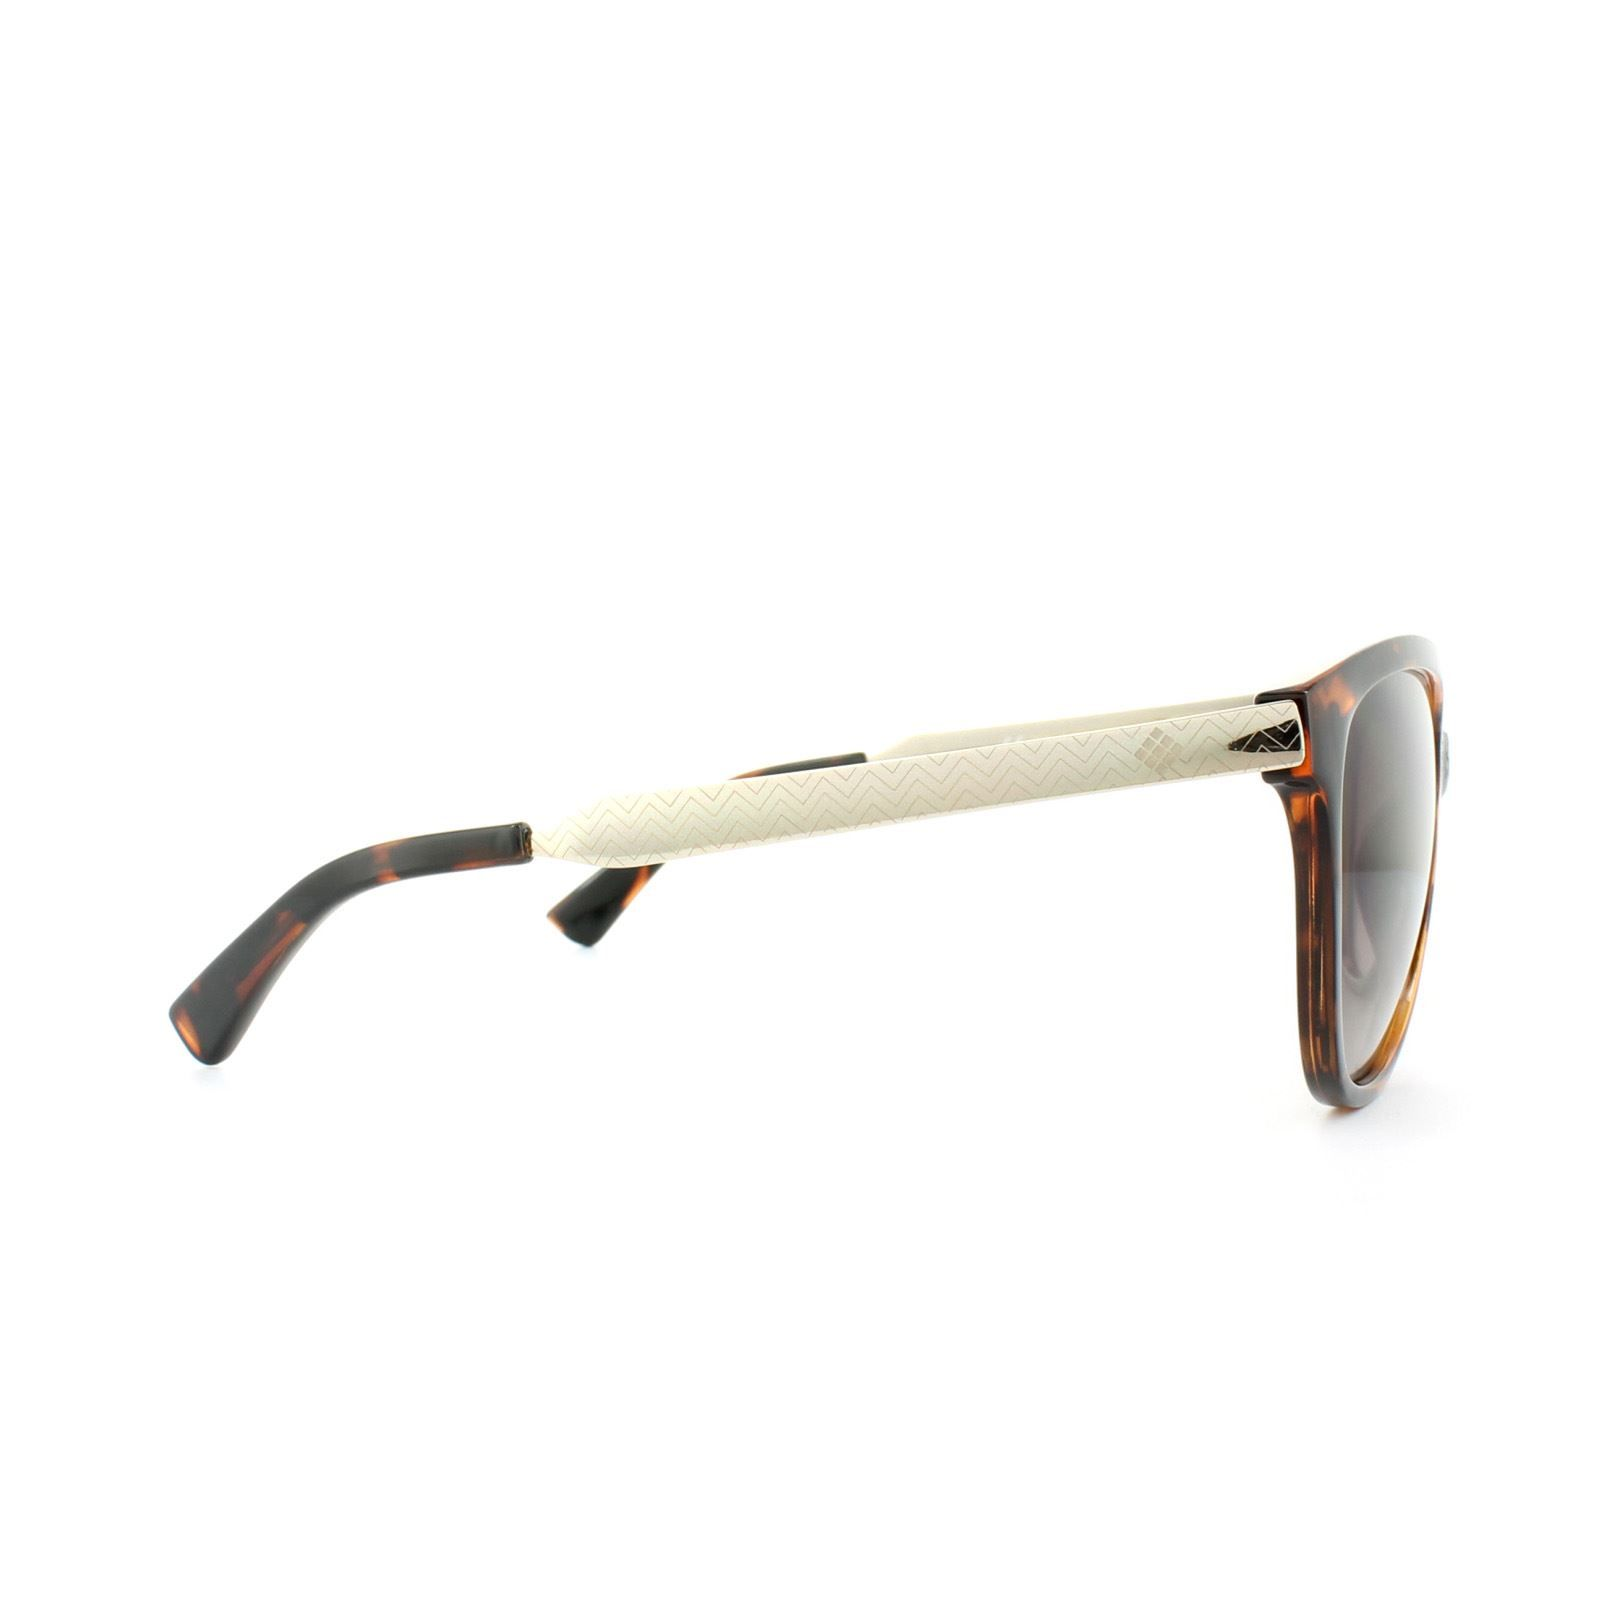 Polaroid Sunglasses PLD 5016/S LLY 94 Havana Gold Brown Gradient Polarized